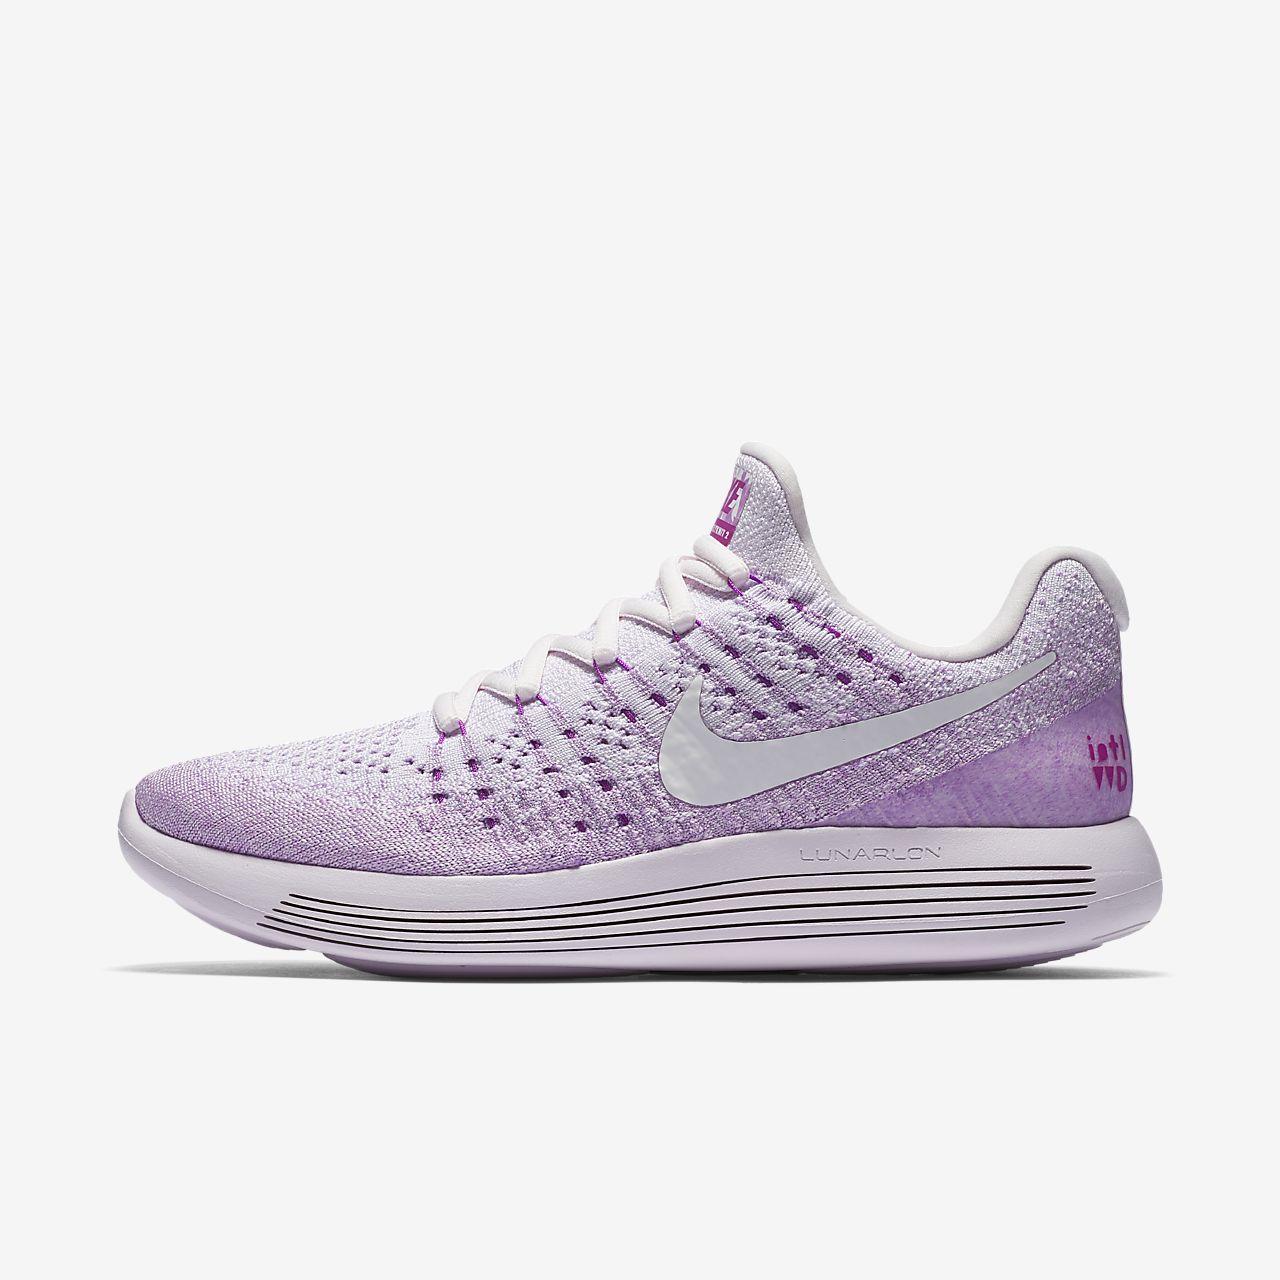 premium selection c6ef1 79f6d Nike LunarEpic Low Flyknit 2 International Womens Day Womens Running Shoe  .